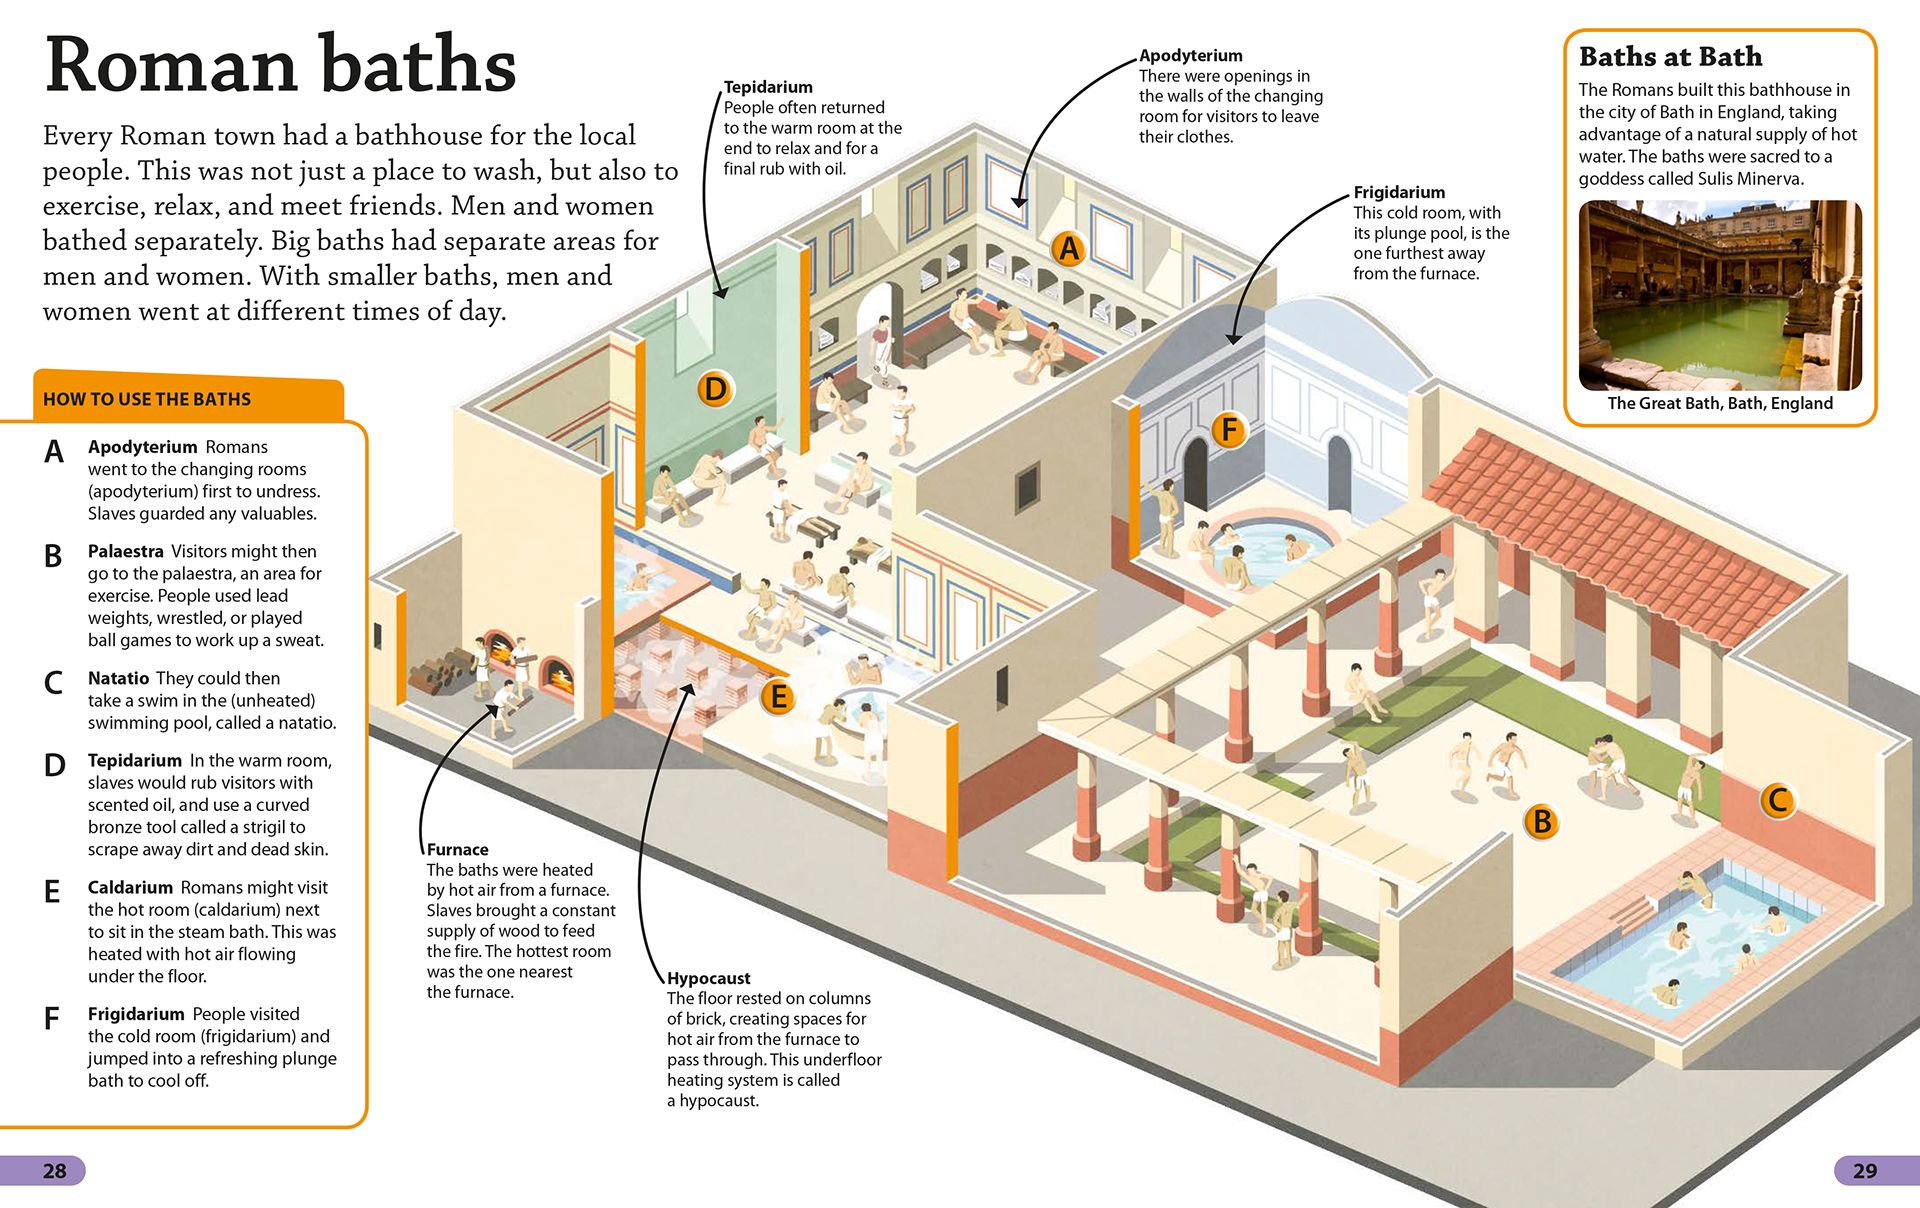 How To Use A Roman Bath Ancient Roman Houses Ancient Rome Architecture Roman Baths